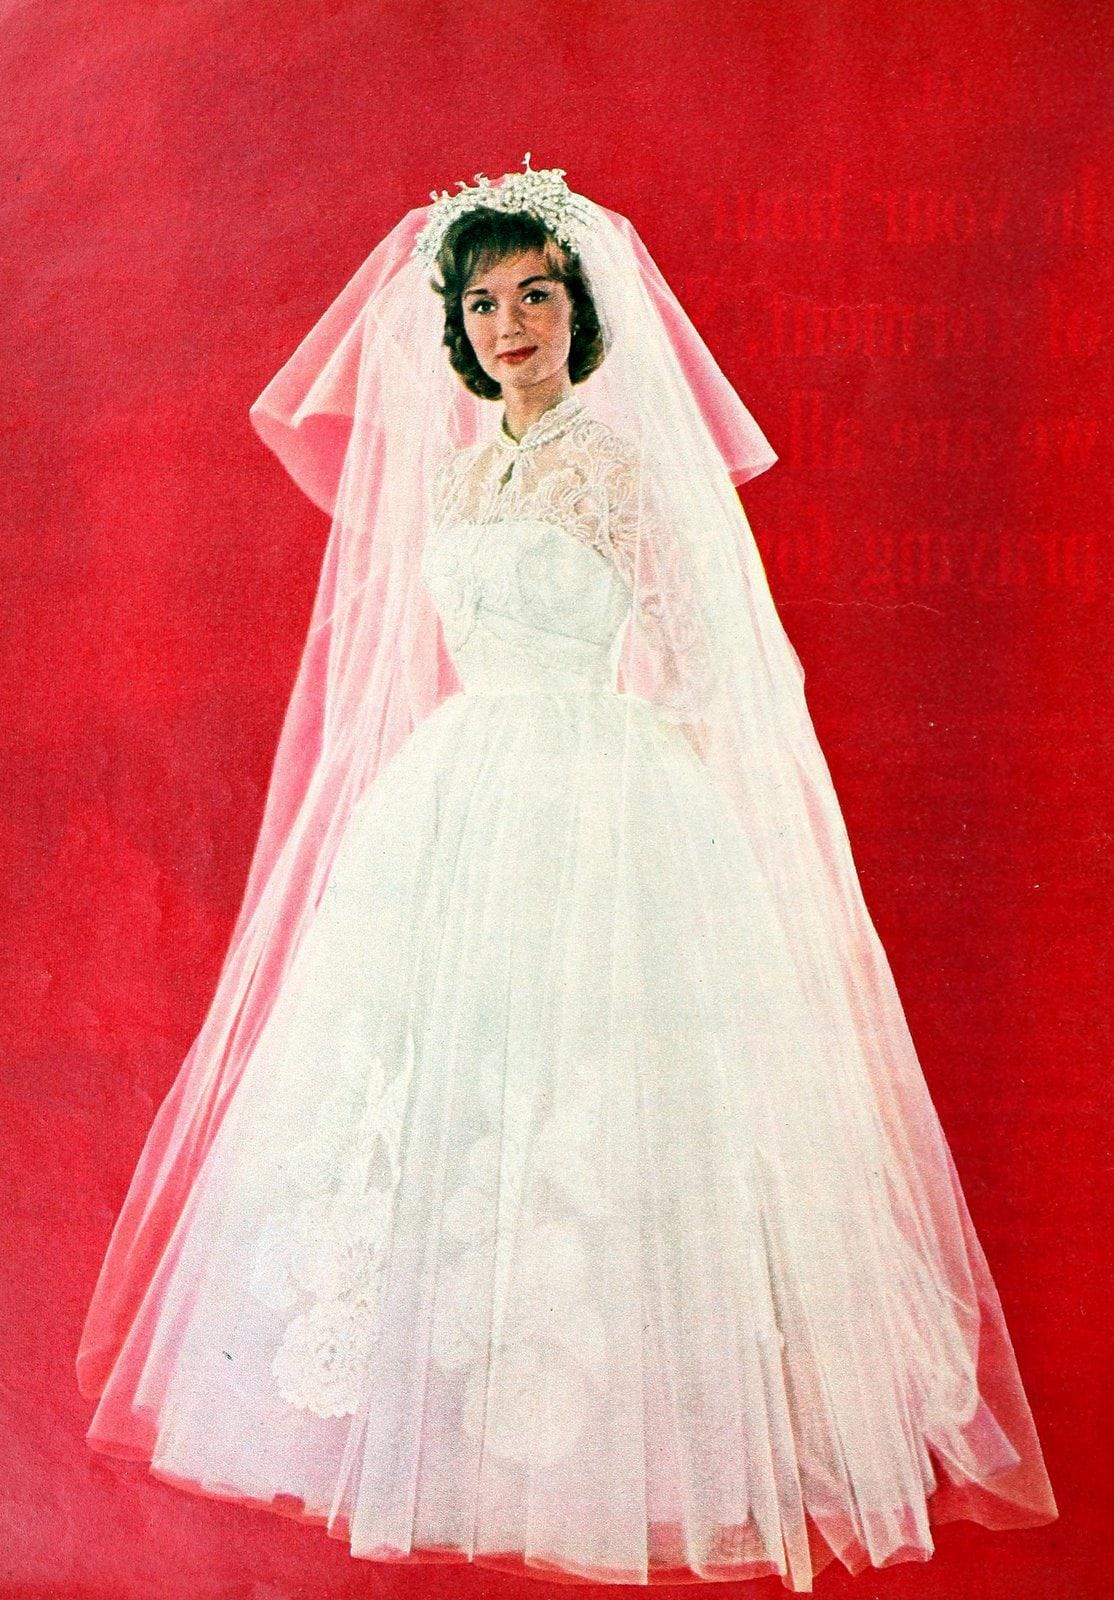 Debbie Reynolds in her wedding dress (1960)